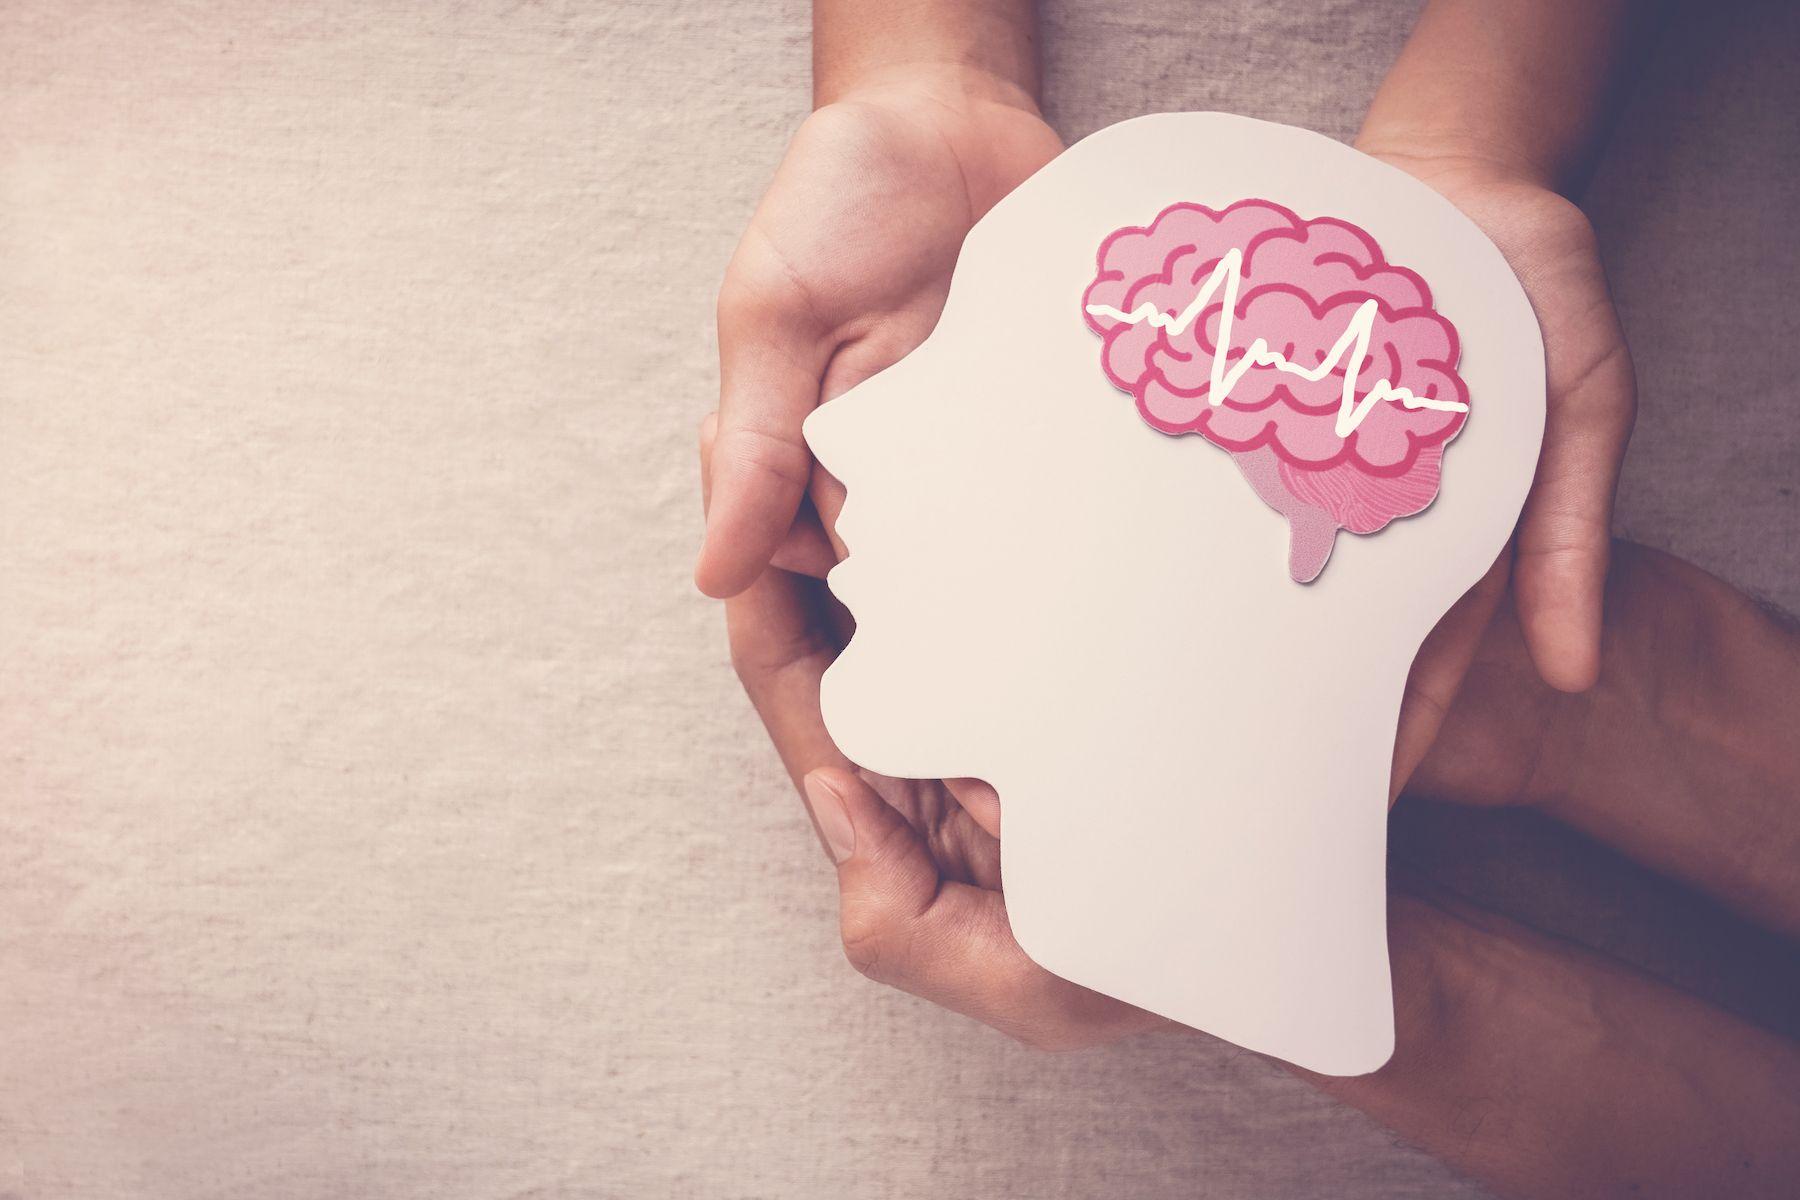 adult-child-hands-holding-encephalography-brain-paper-cutout-epilepsy-alzheimer-awareness-seizure-disorder-mental-health-concept.jpg